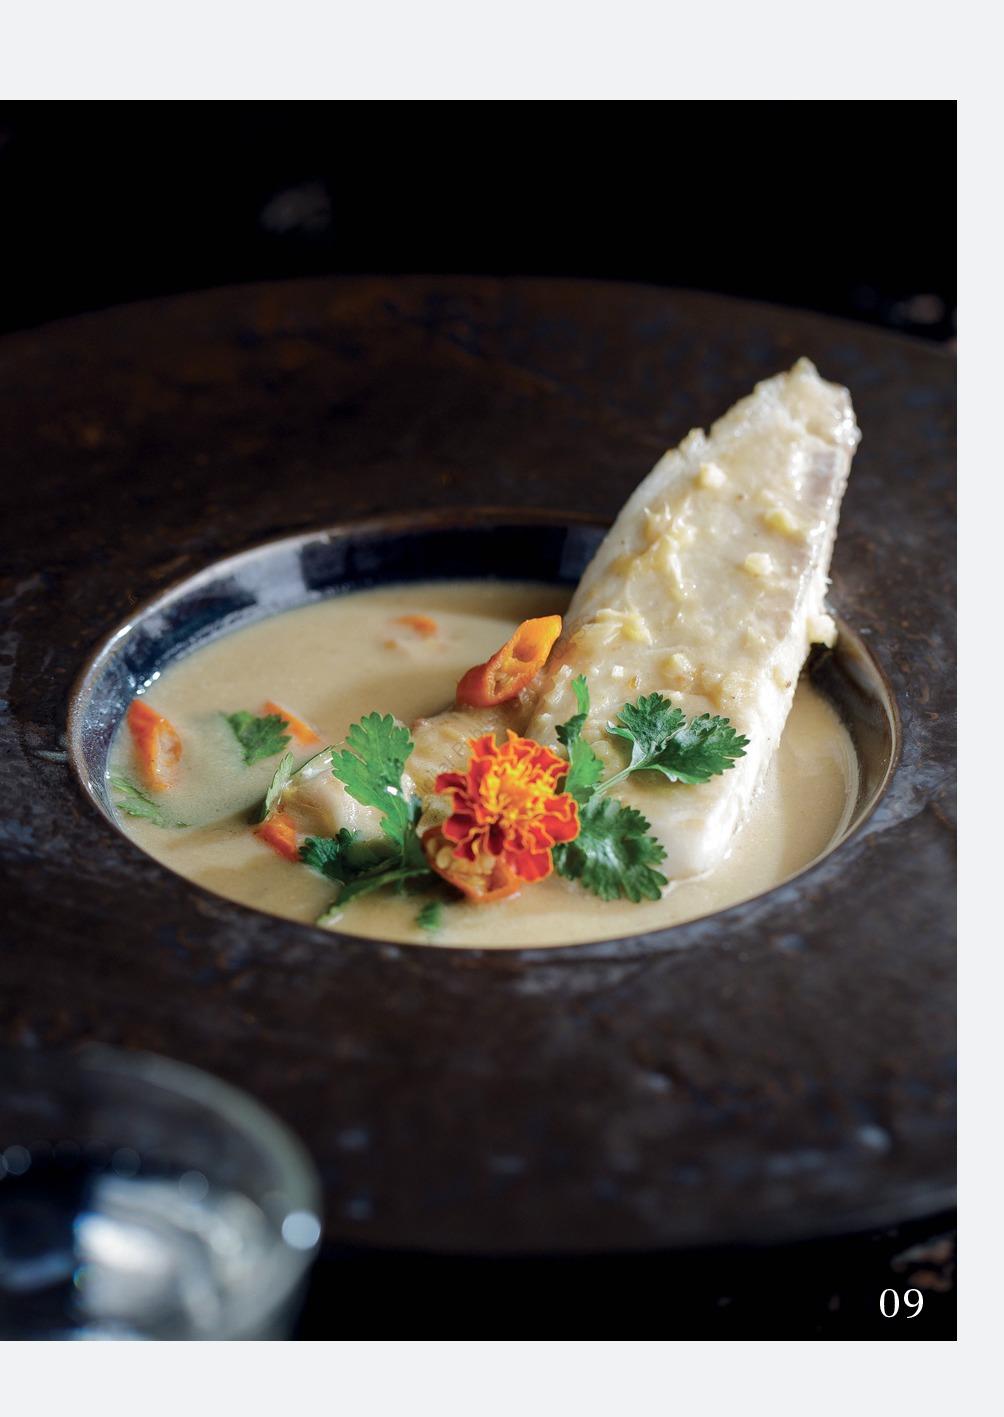 Chef Norman In The Kitchen 40 Resep Masakan Nusantara Penyajian Elegan Book By Norman Ismail Gramedia Digital